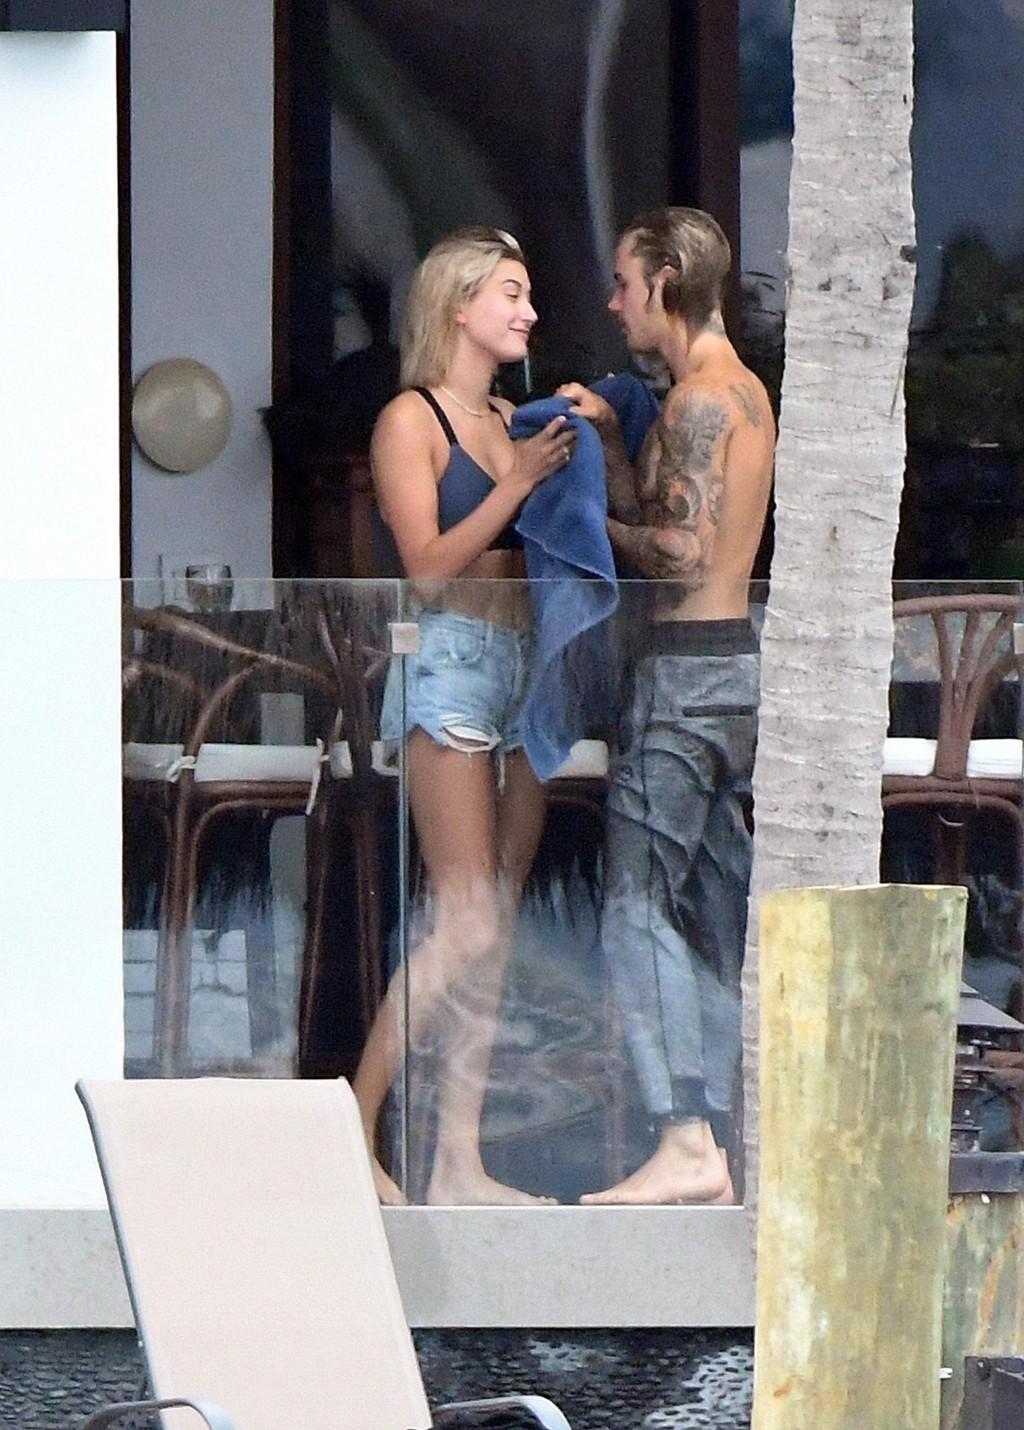 UADSKILLELIGE: Justin Bieber og Hailey Baldwin ble denne helgen observert i Miami, og ifølge ryktene skal de ha vært uadskillelige.